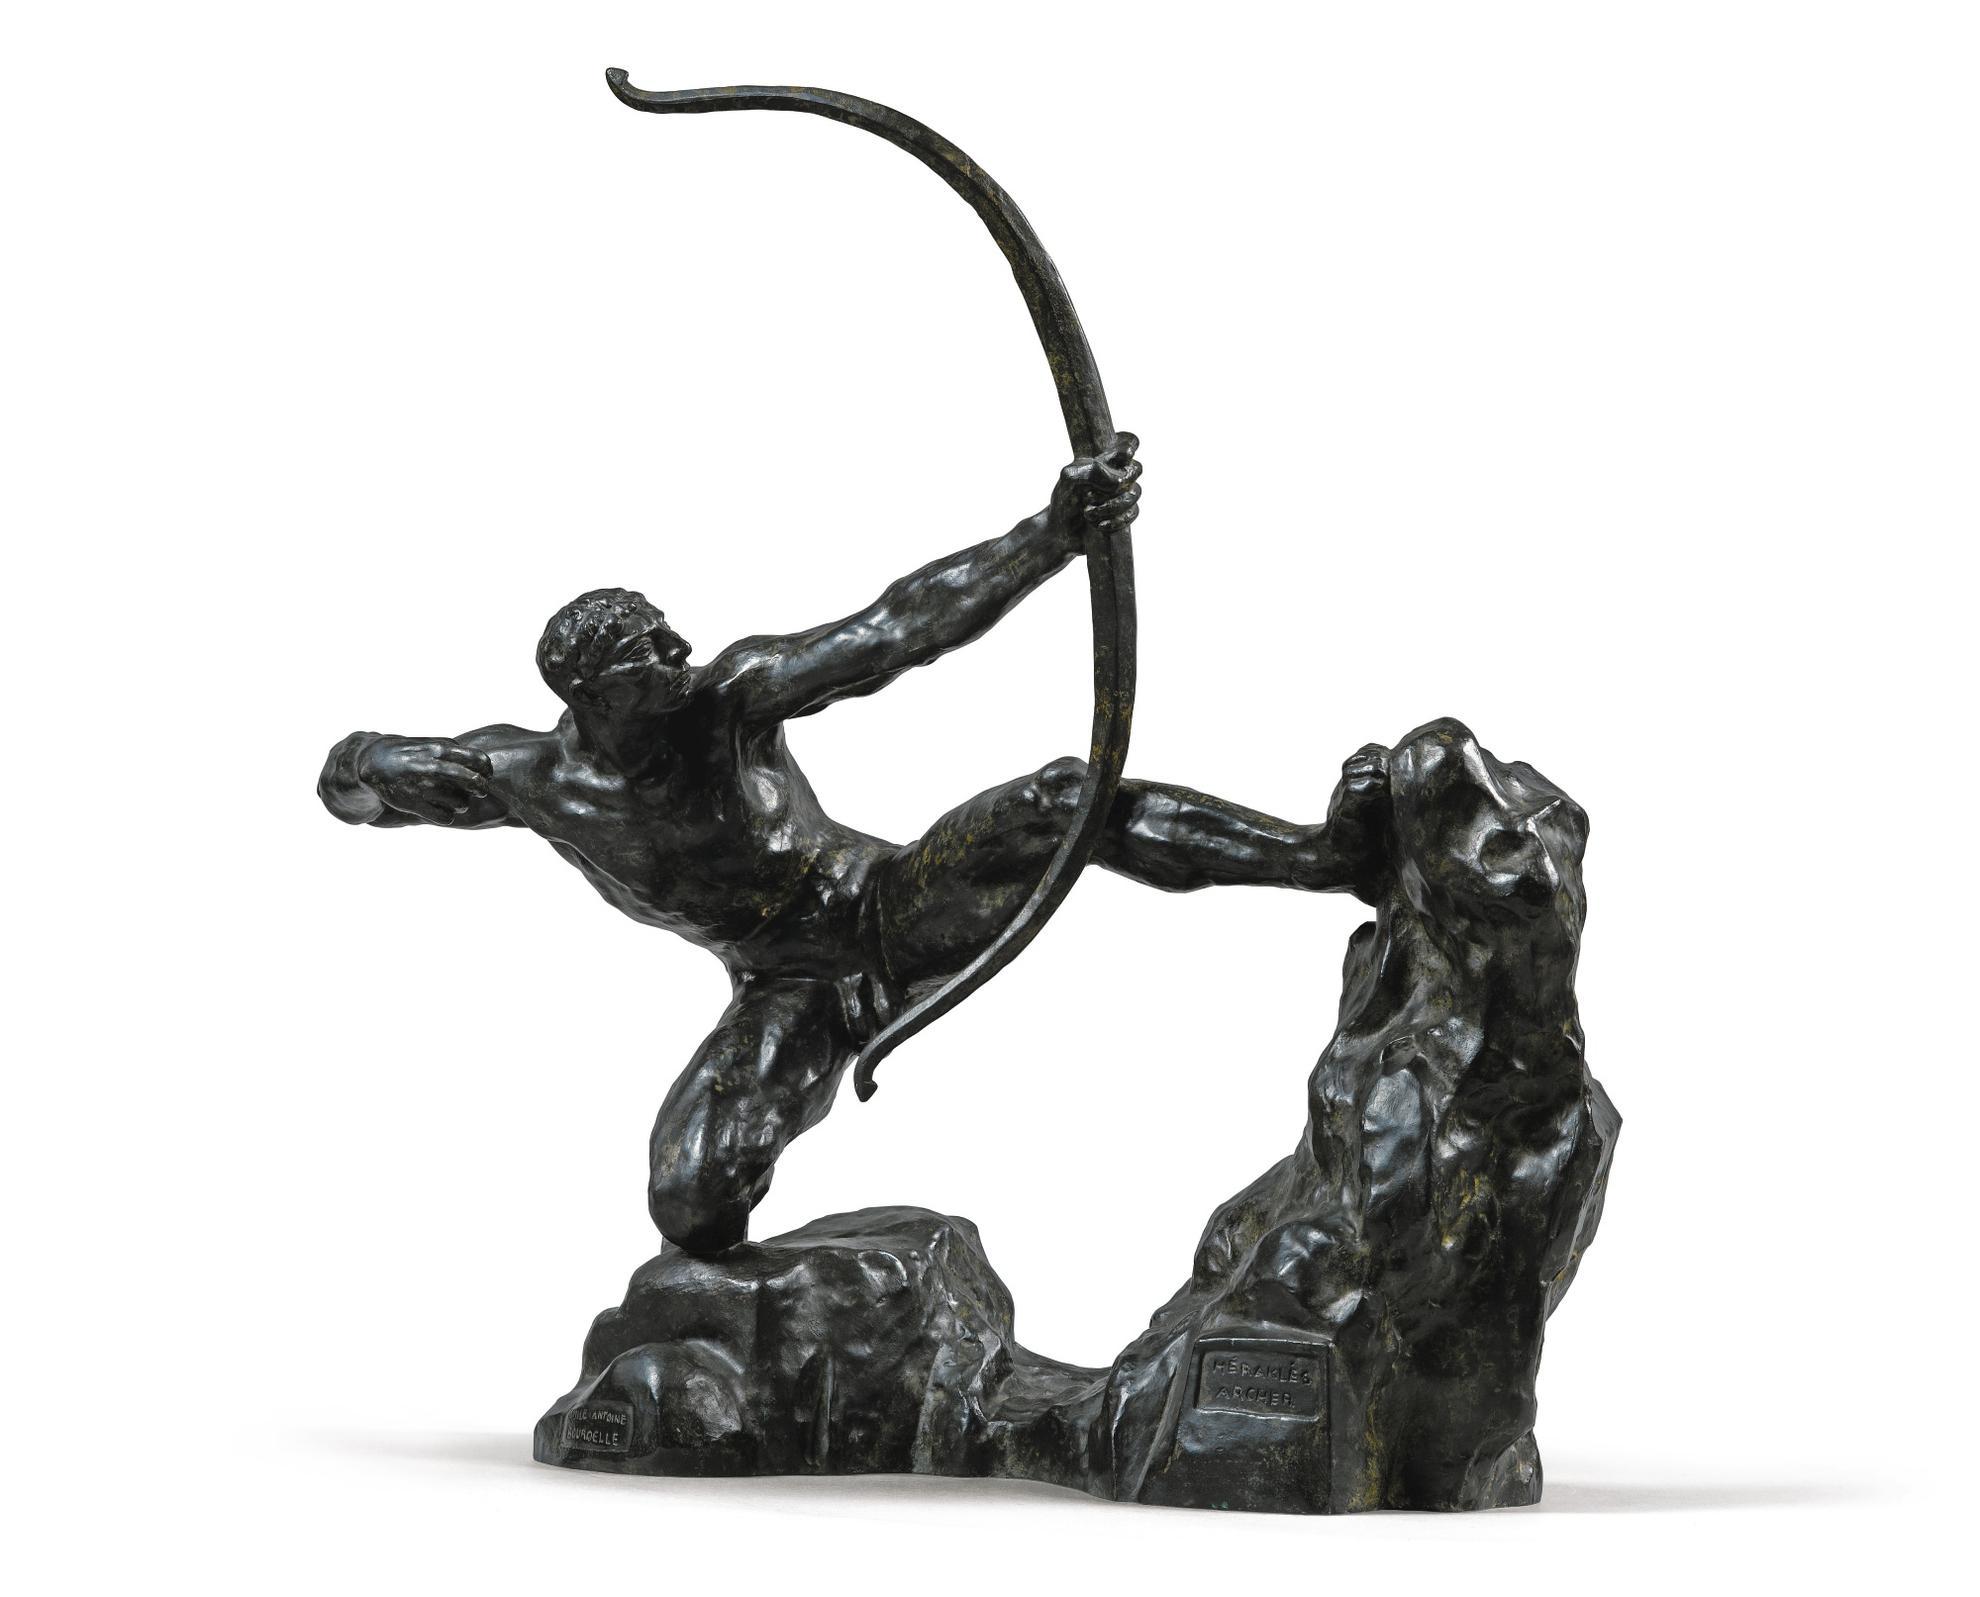 Emile Antoine Bourdelle - Herakles Archer, Huitieme Etude, Modele Intermediaire Definitif-1909